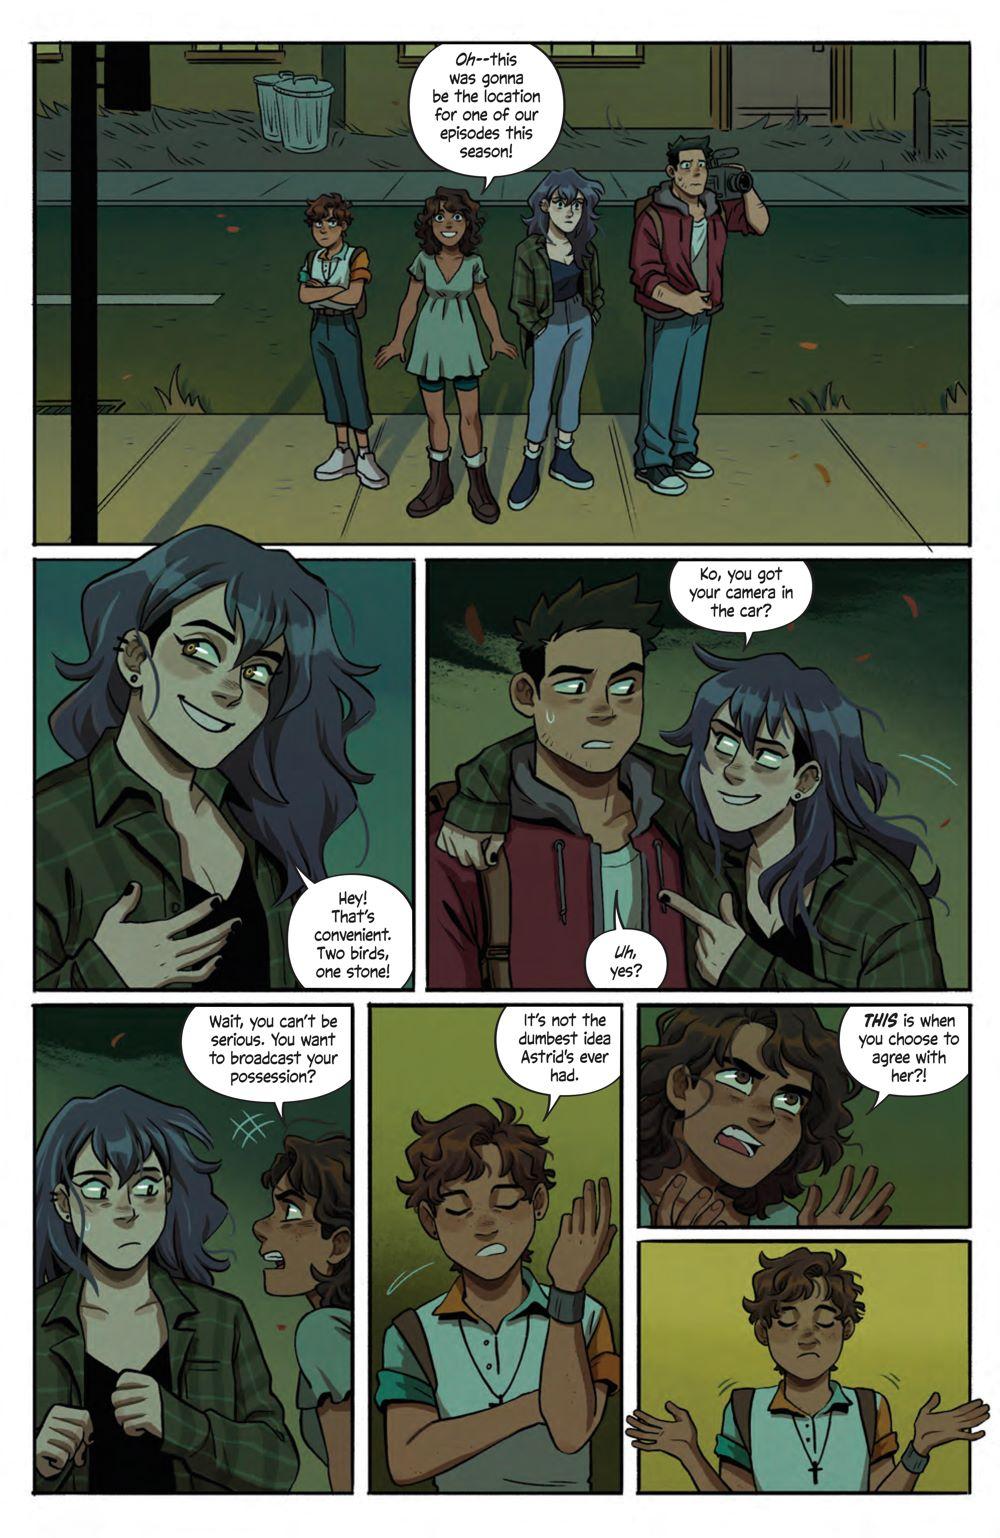 SpecterInspectors_002_PRESS_5 ComicList Previews: SPECTER INSPECTORS #2 (OF 5)